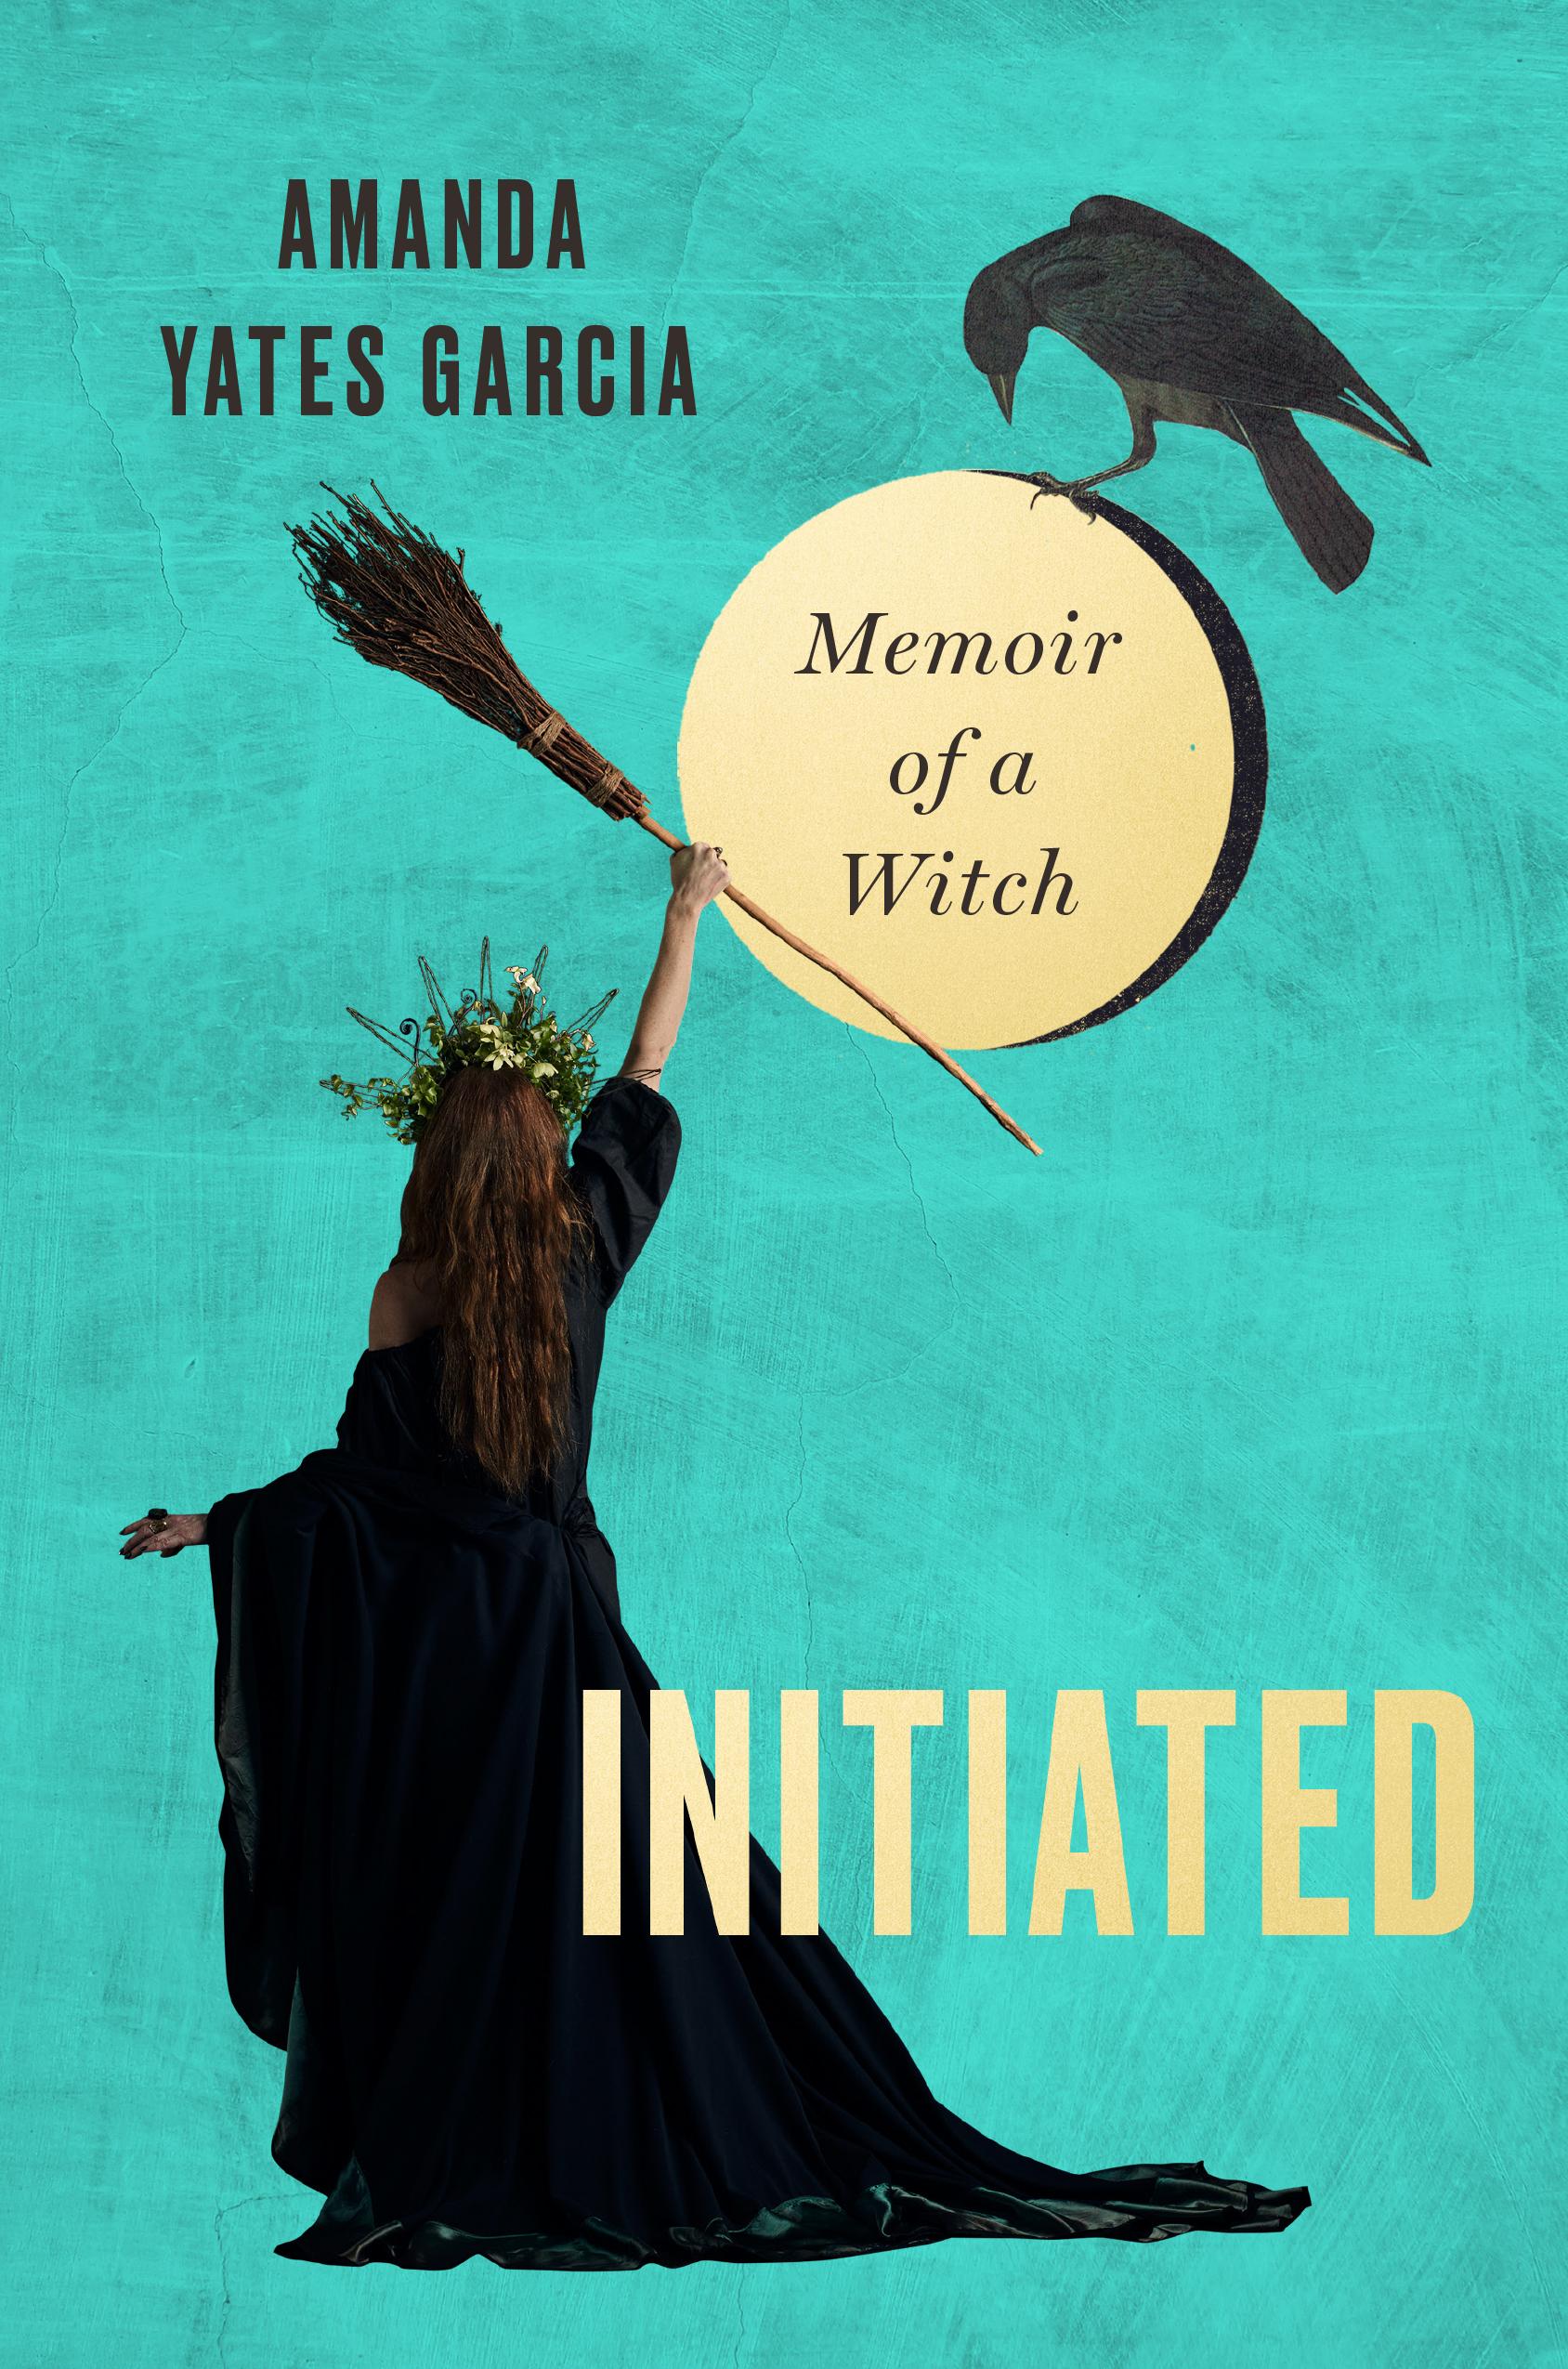 Book Launch: Initiated by Amanda Yates Garcia